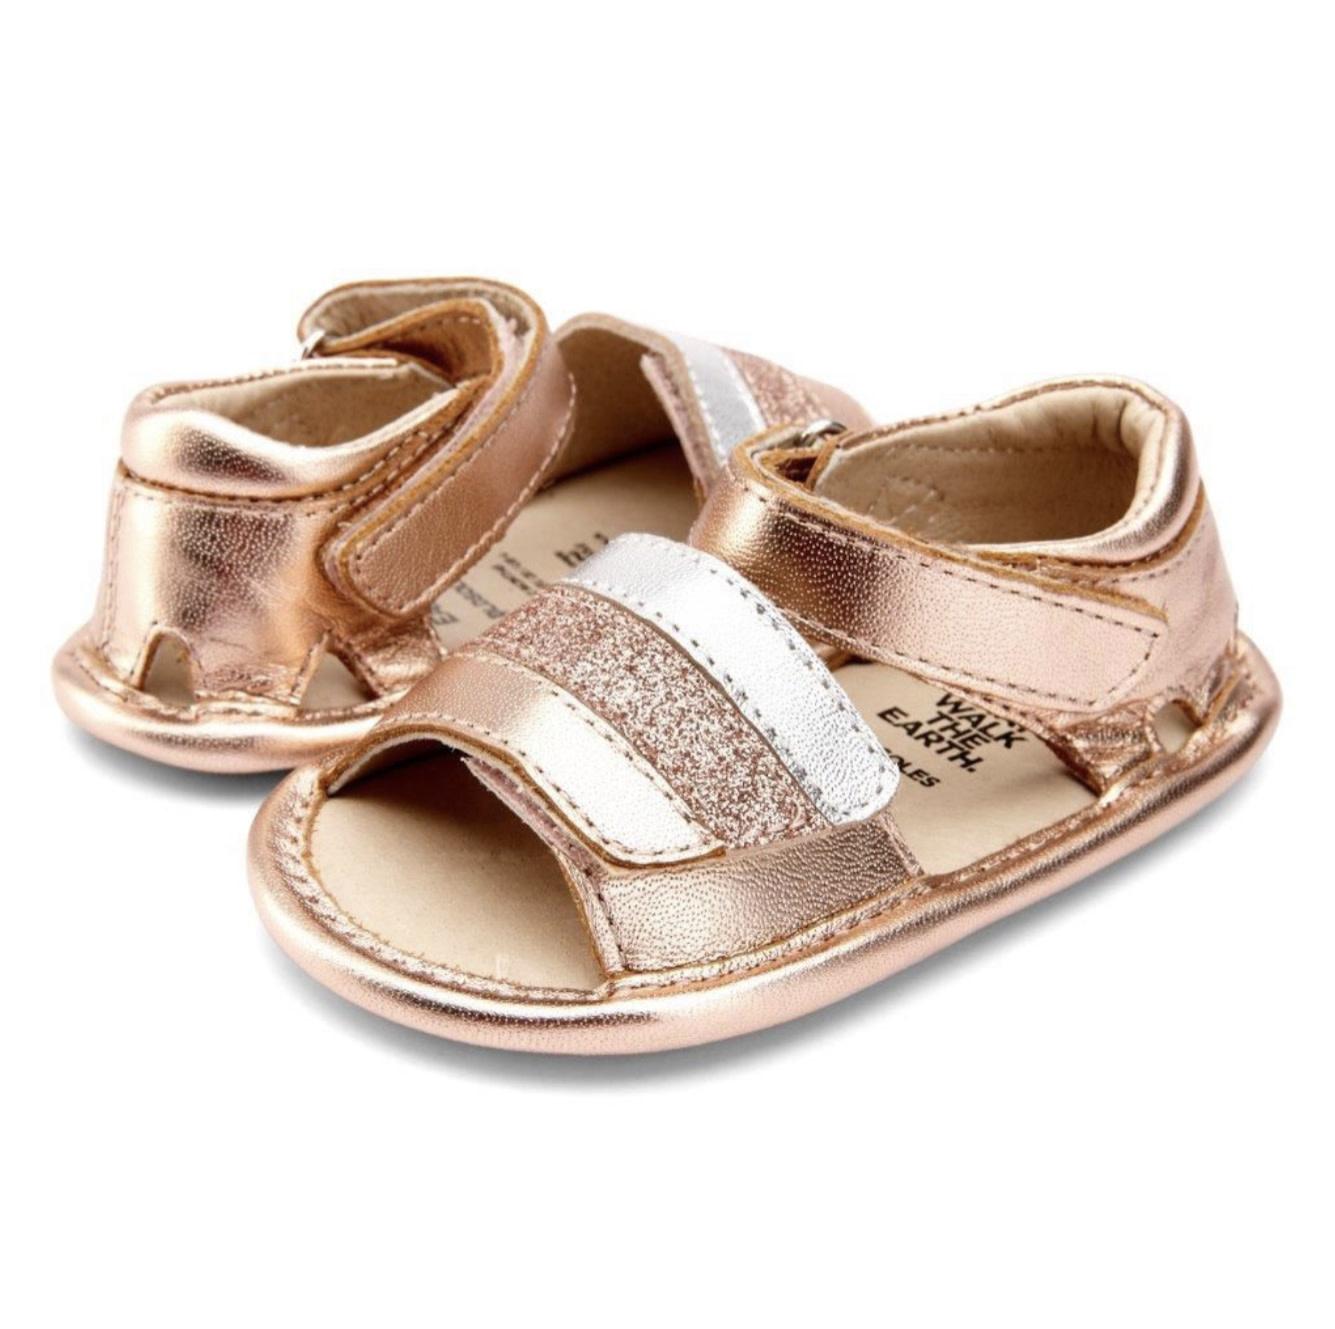 OLD SOLES Mini Jetsetter